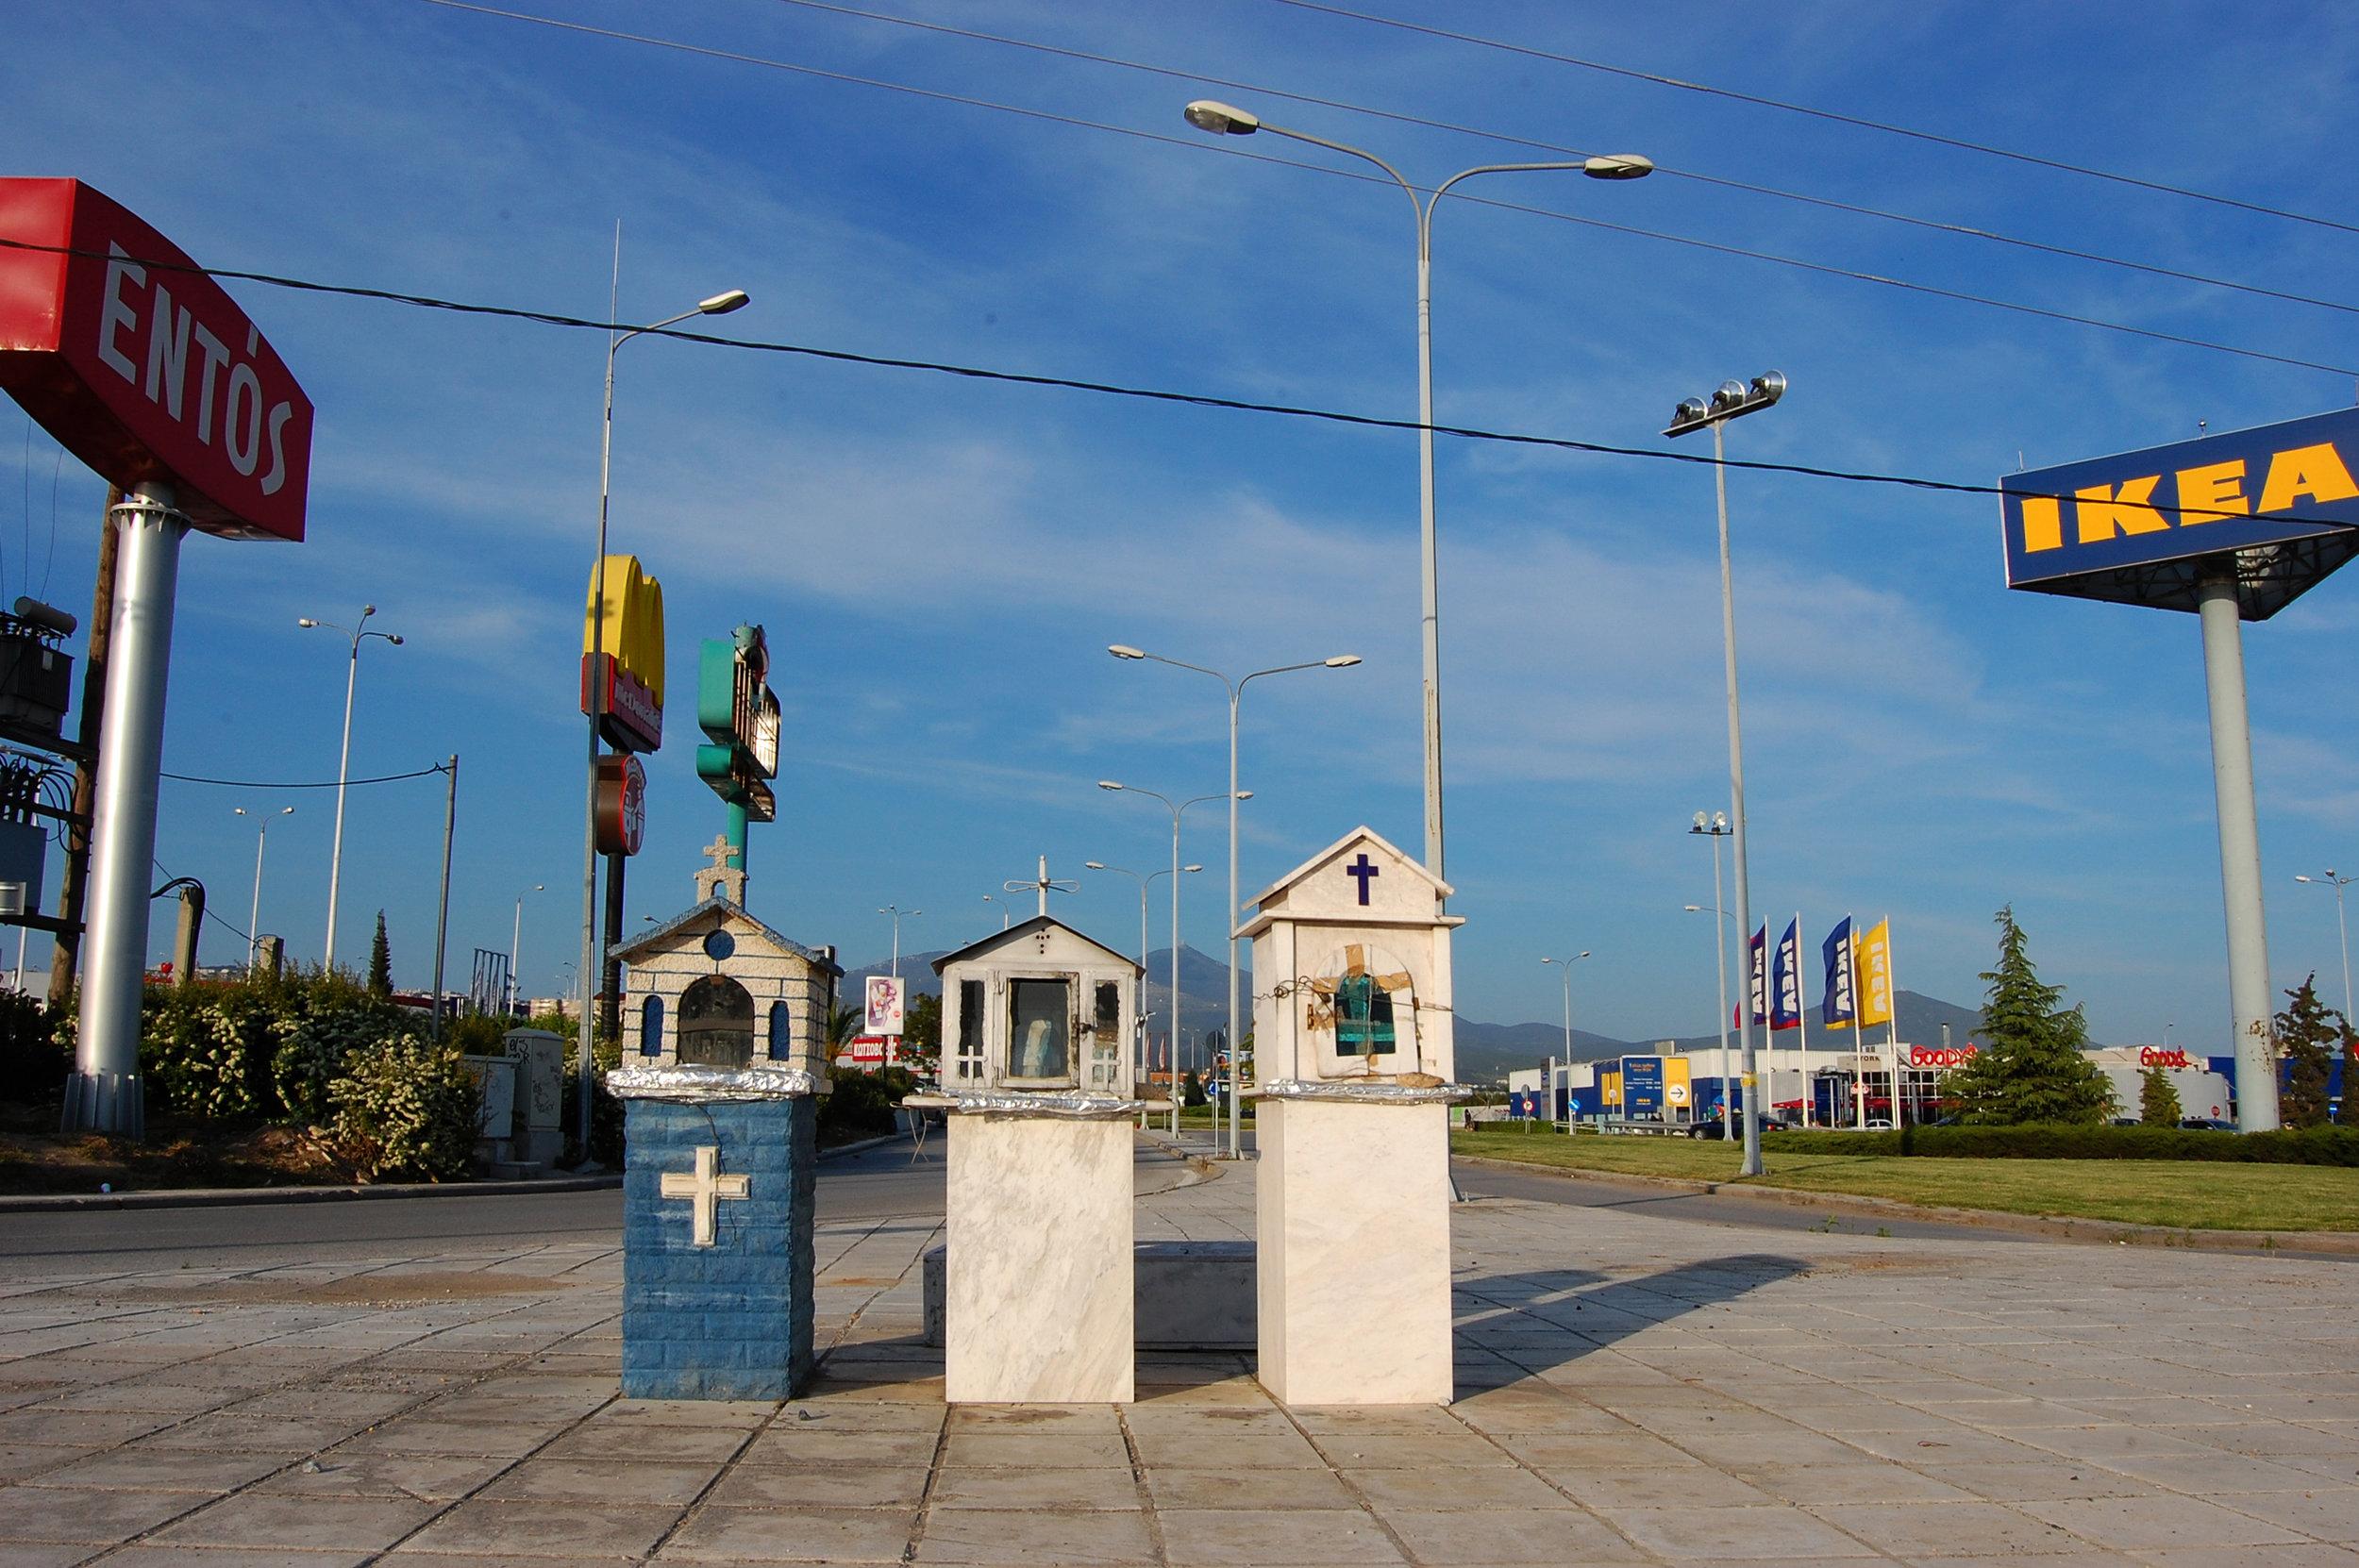 PW_090509_Albania_418.jpg